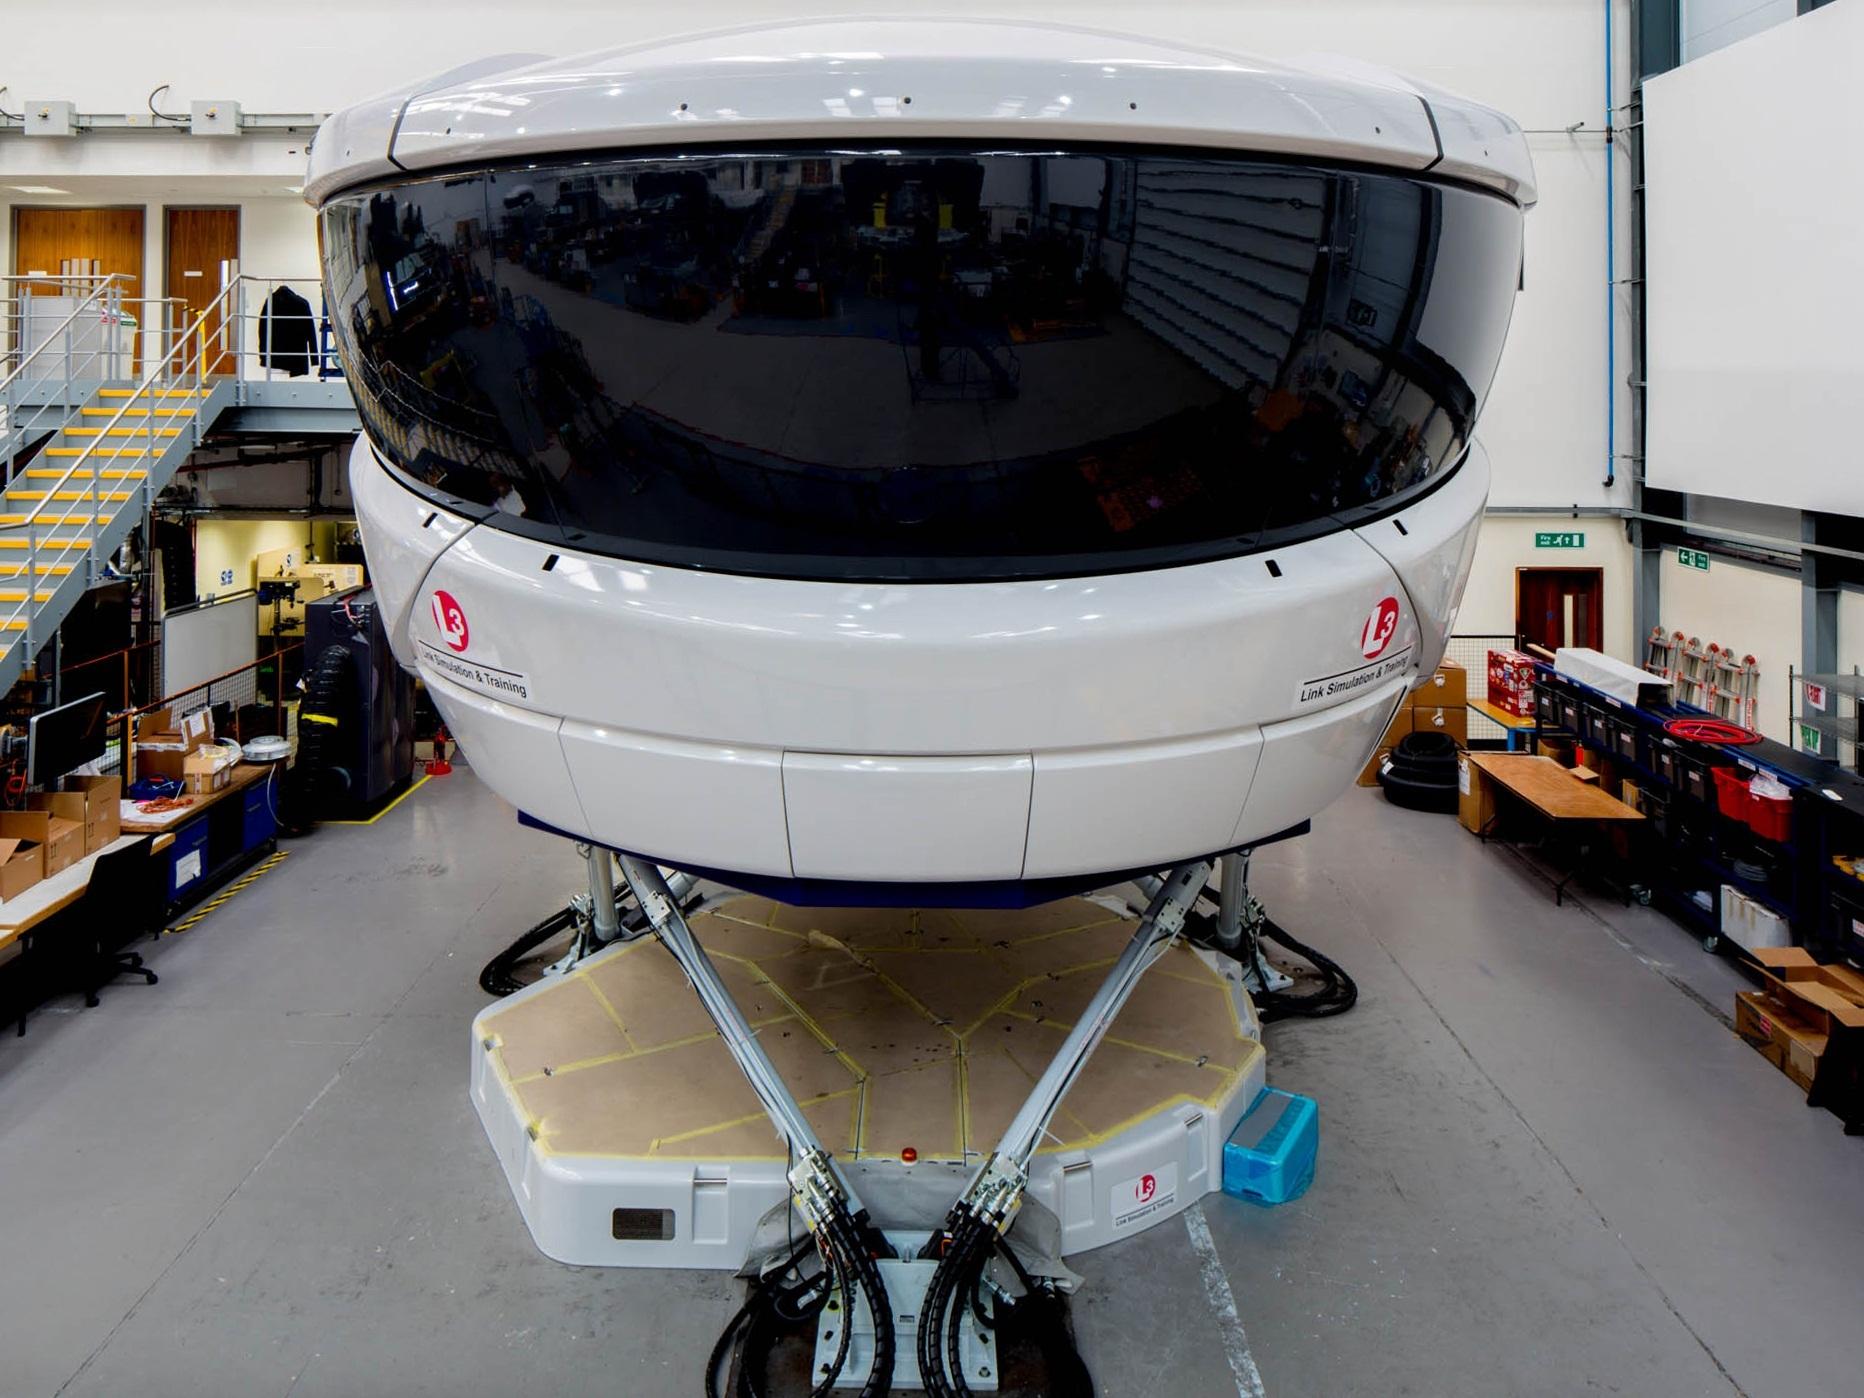 L-3 Link Simulation & Training Cuts Engineering Change